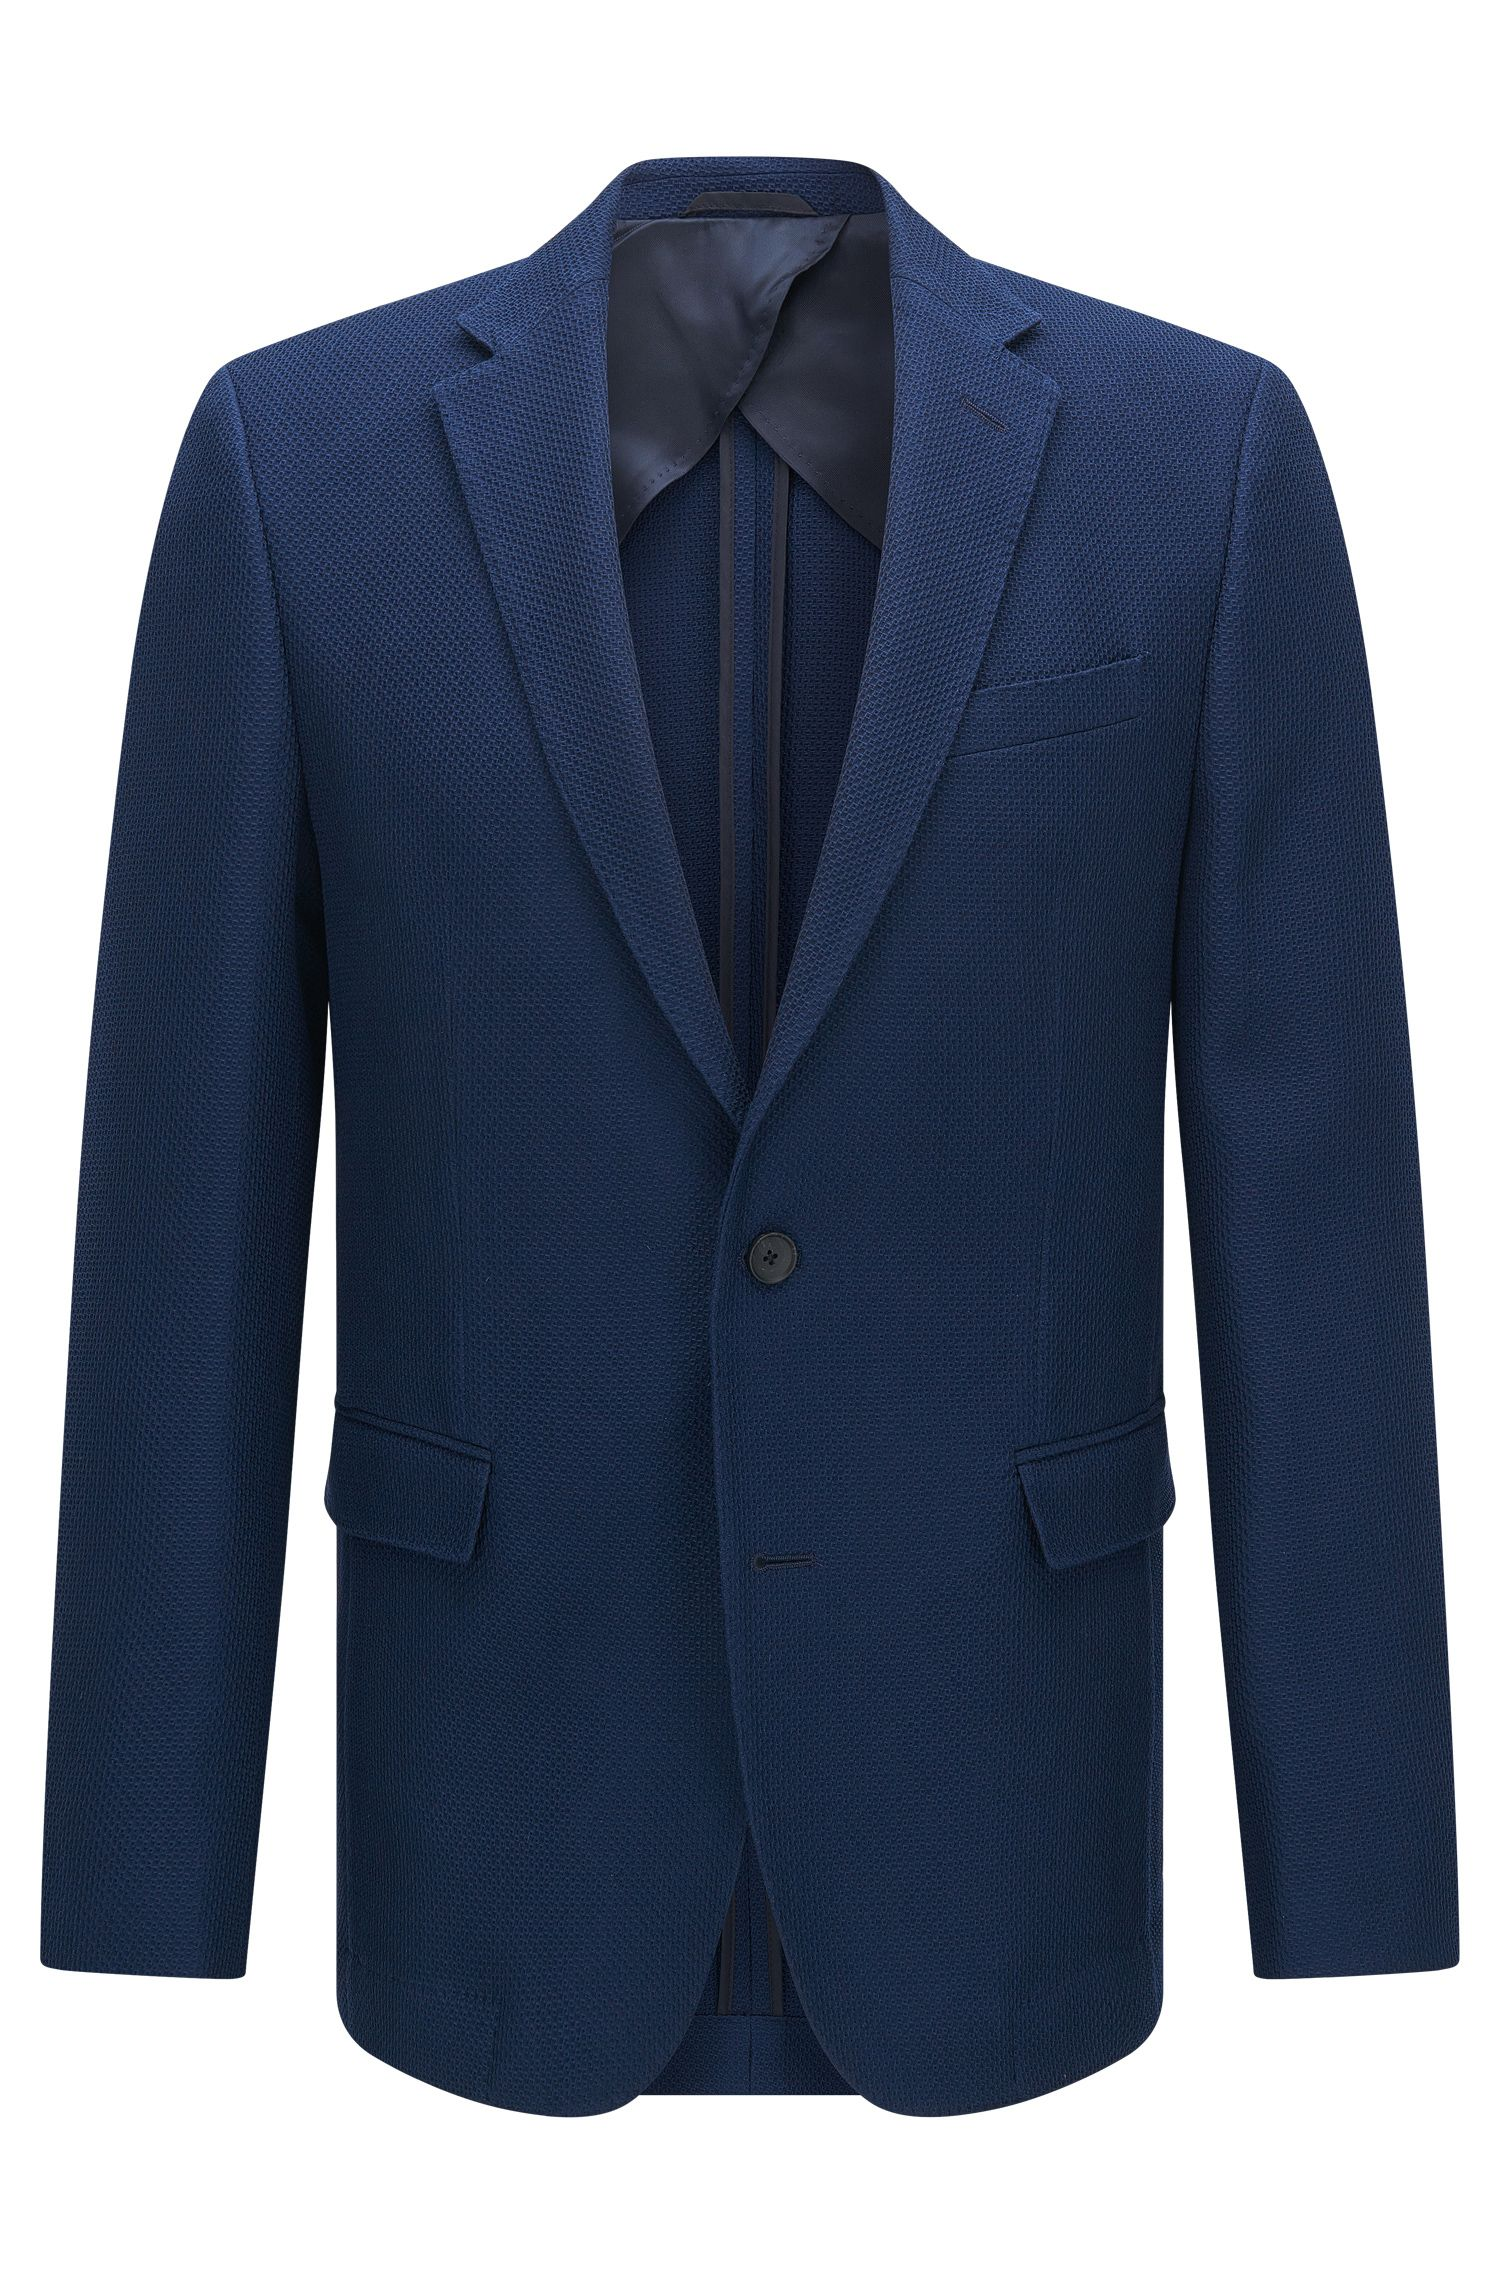 Virgin Wool Cotton Sport Coat, Slim Fit | Nobis